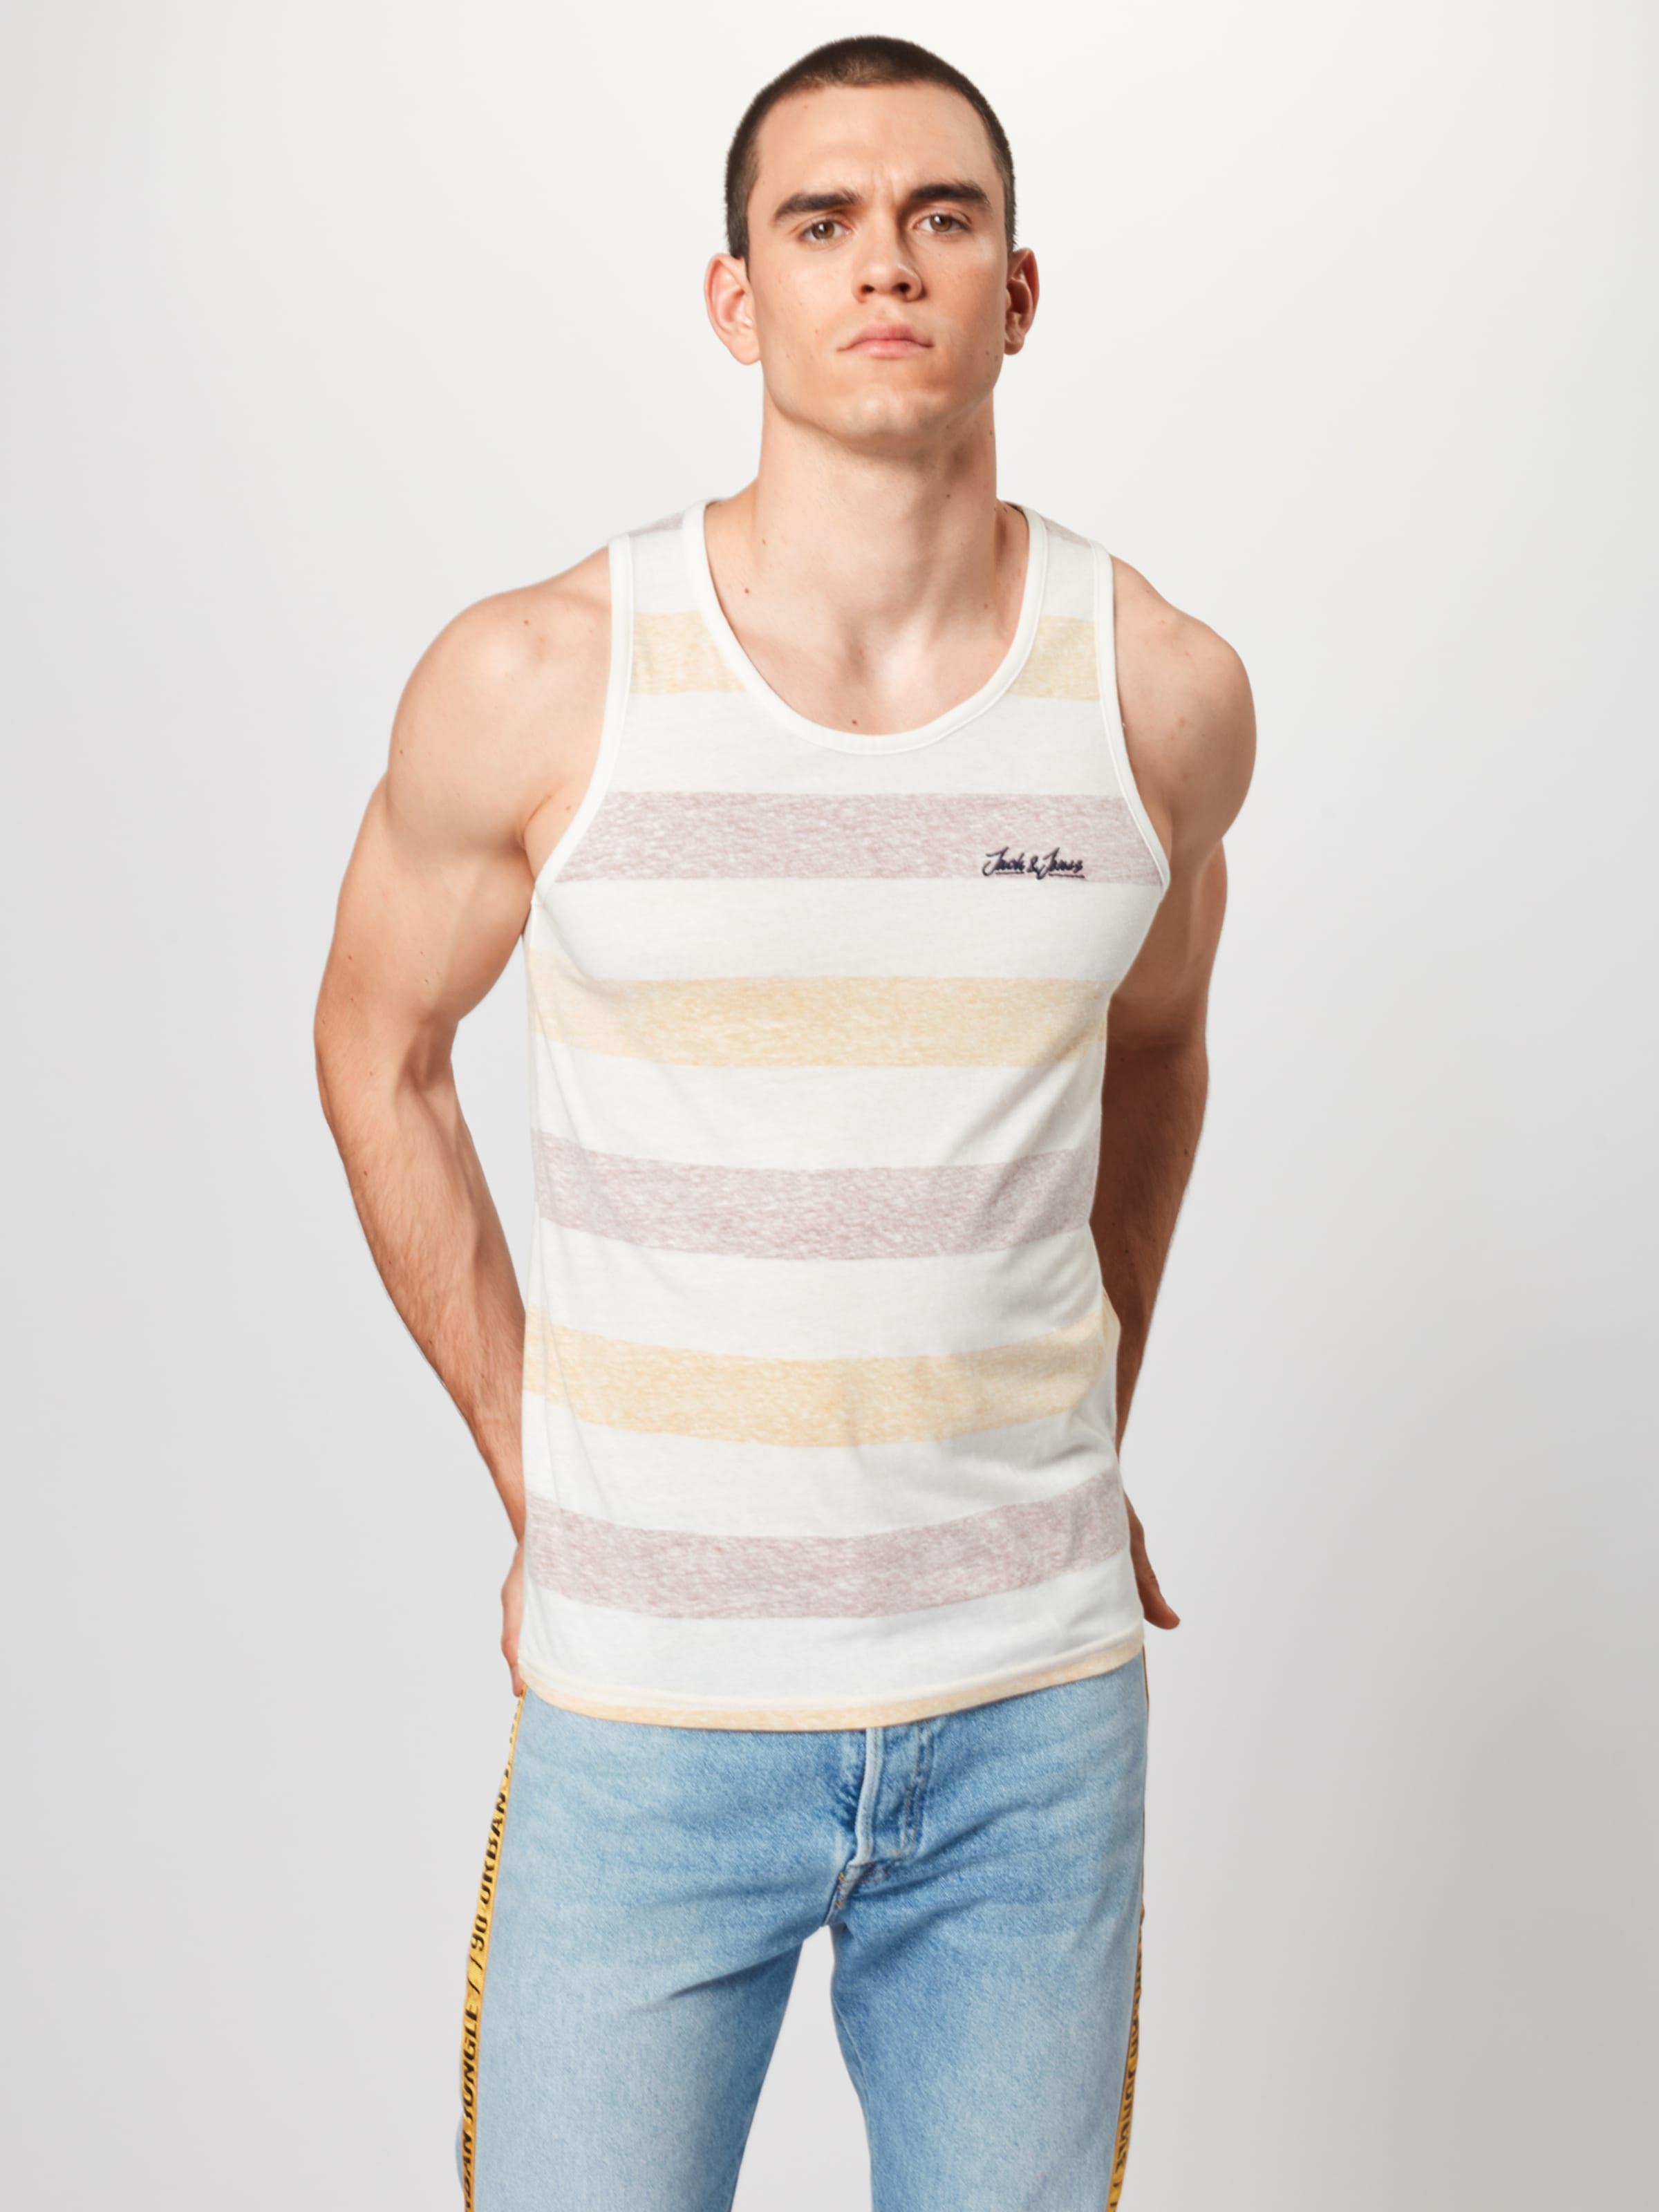 Jones Cassé 'jorsider Blanc T Jackamp; Tank OrangeRouge En shirt Top' dxeoCB